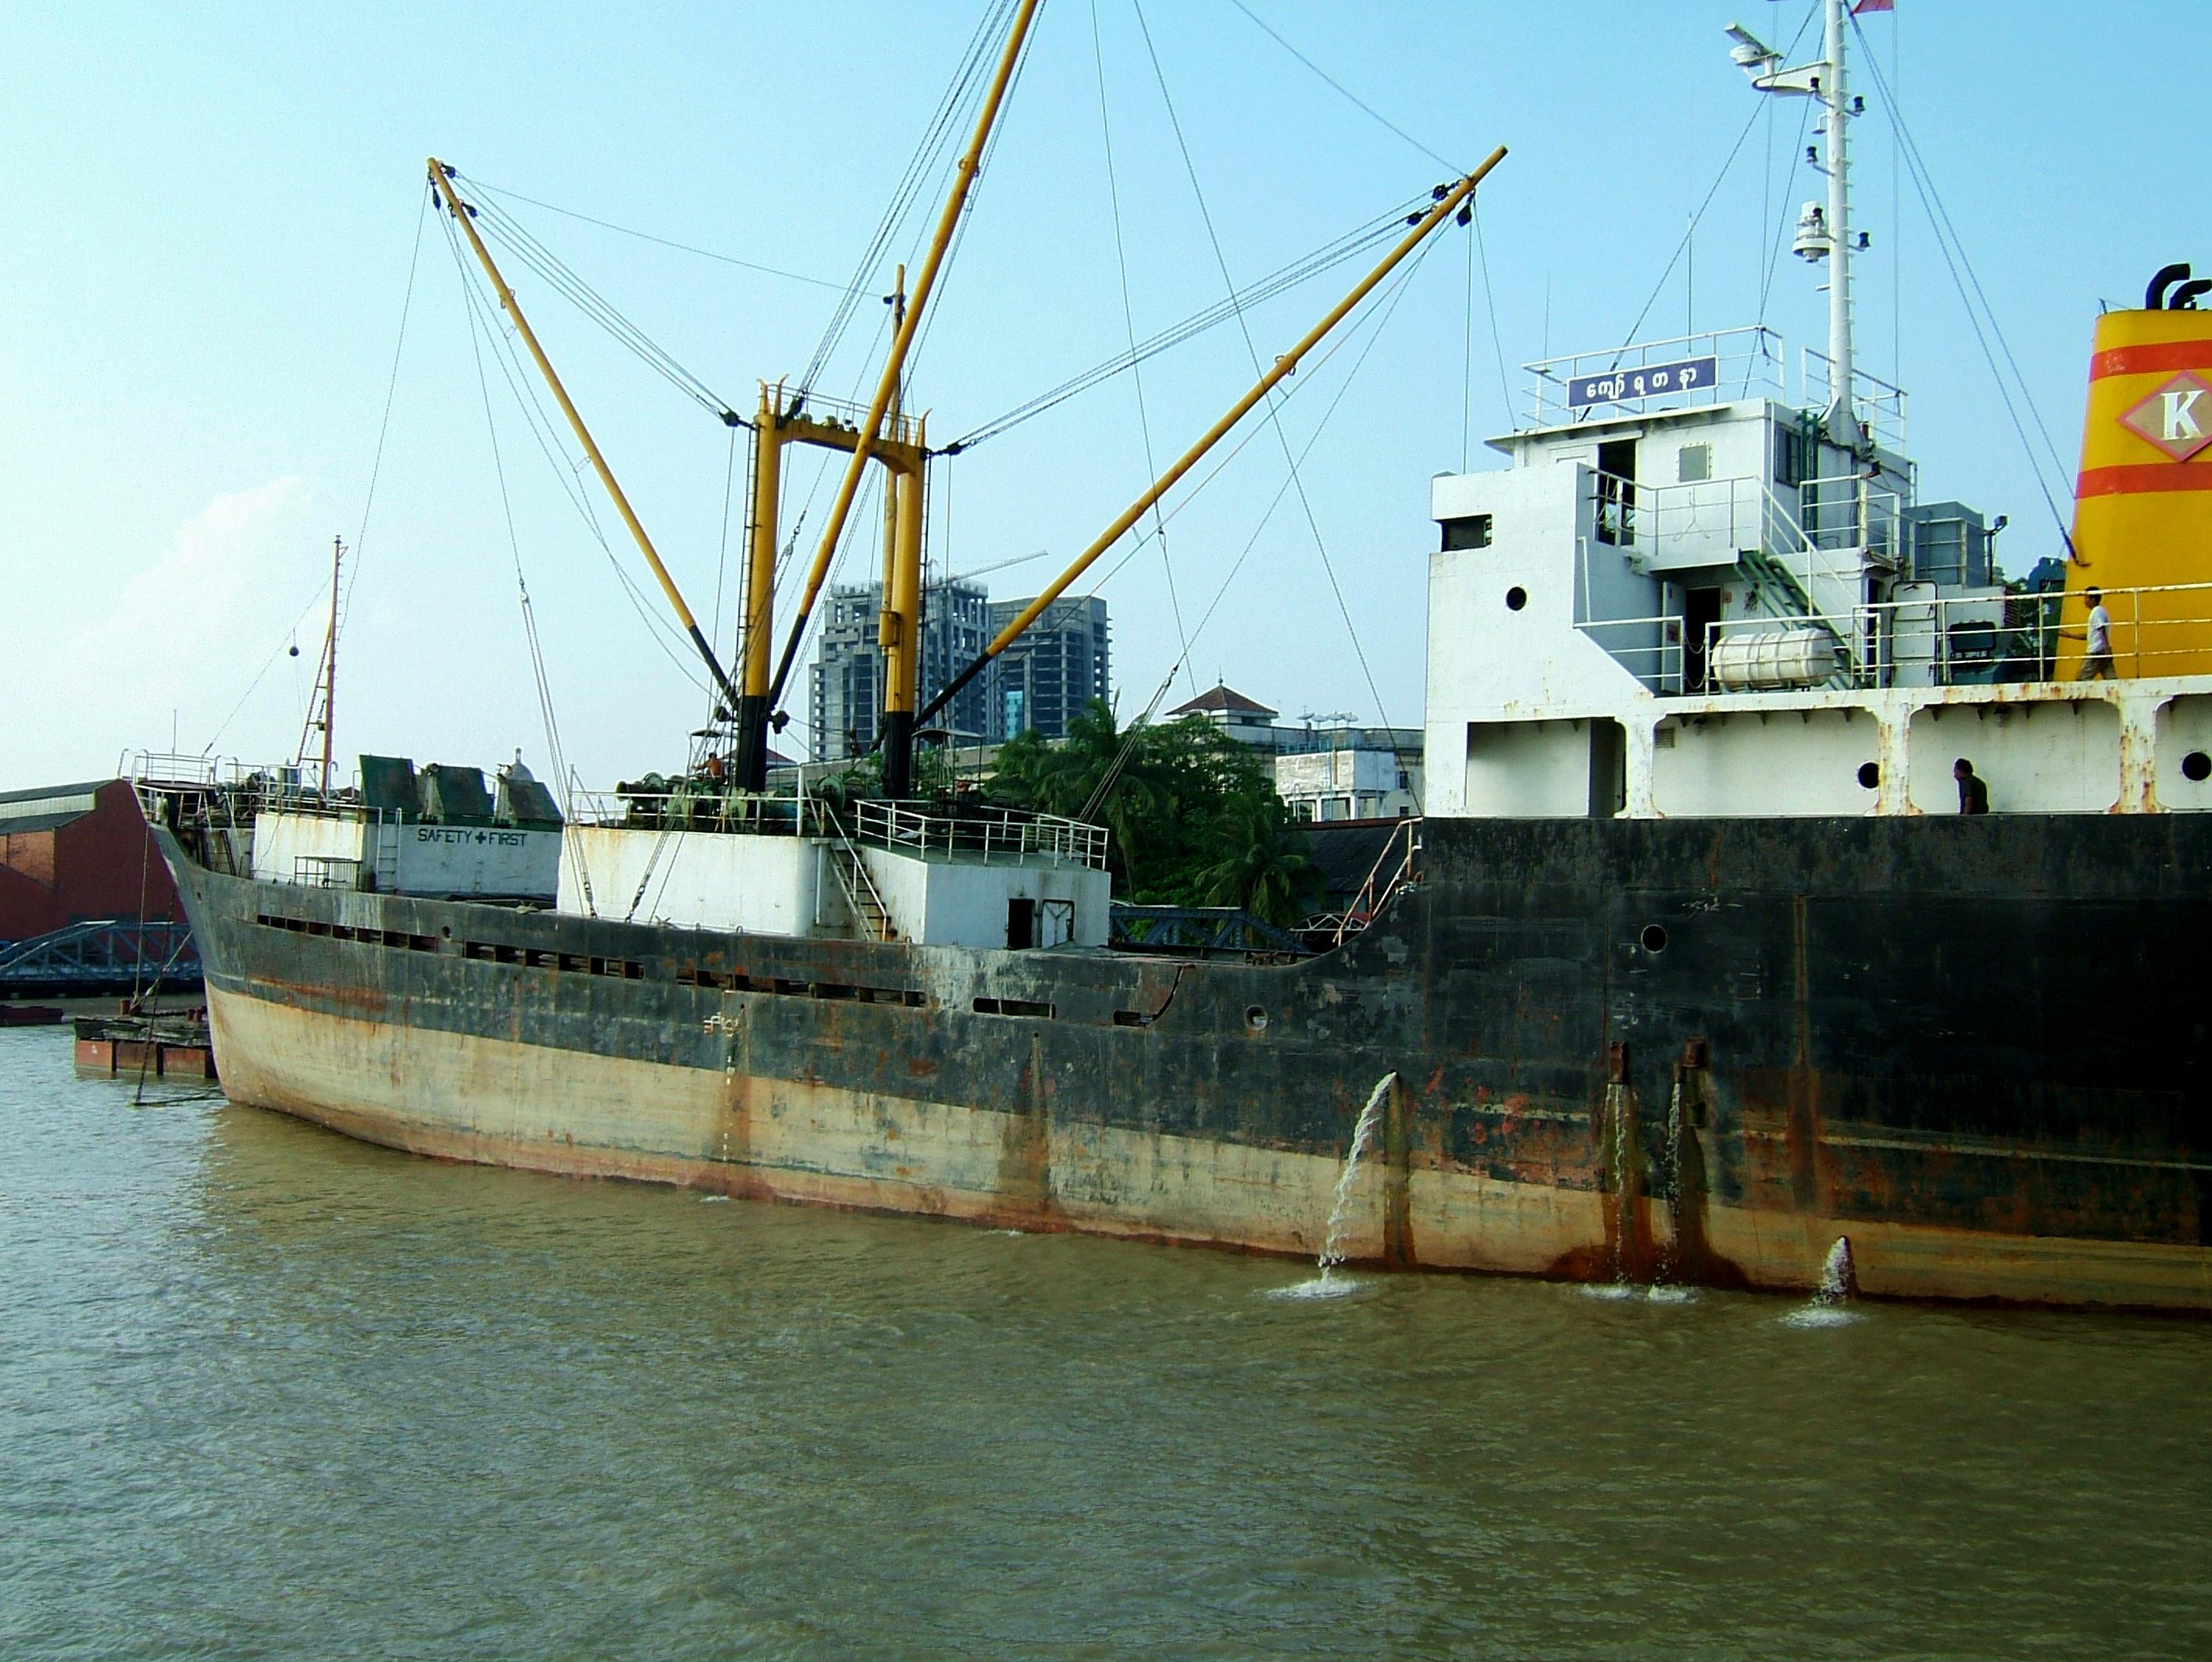 MV Kyaw Yadanar Yangon port Myanmar Oct 2004 05